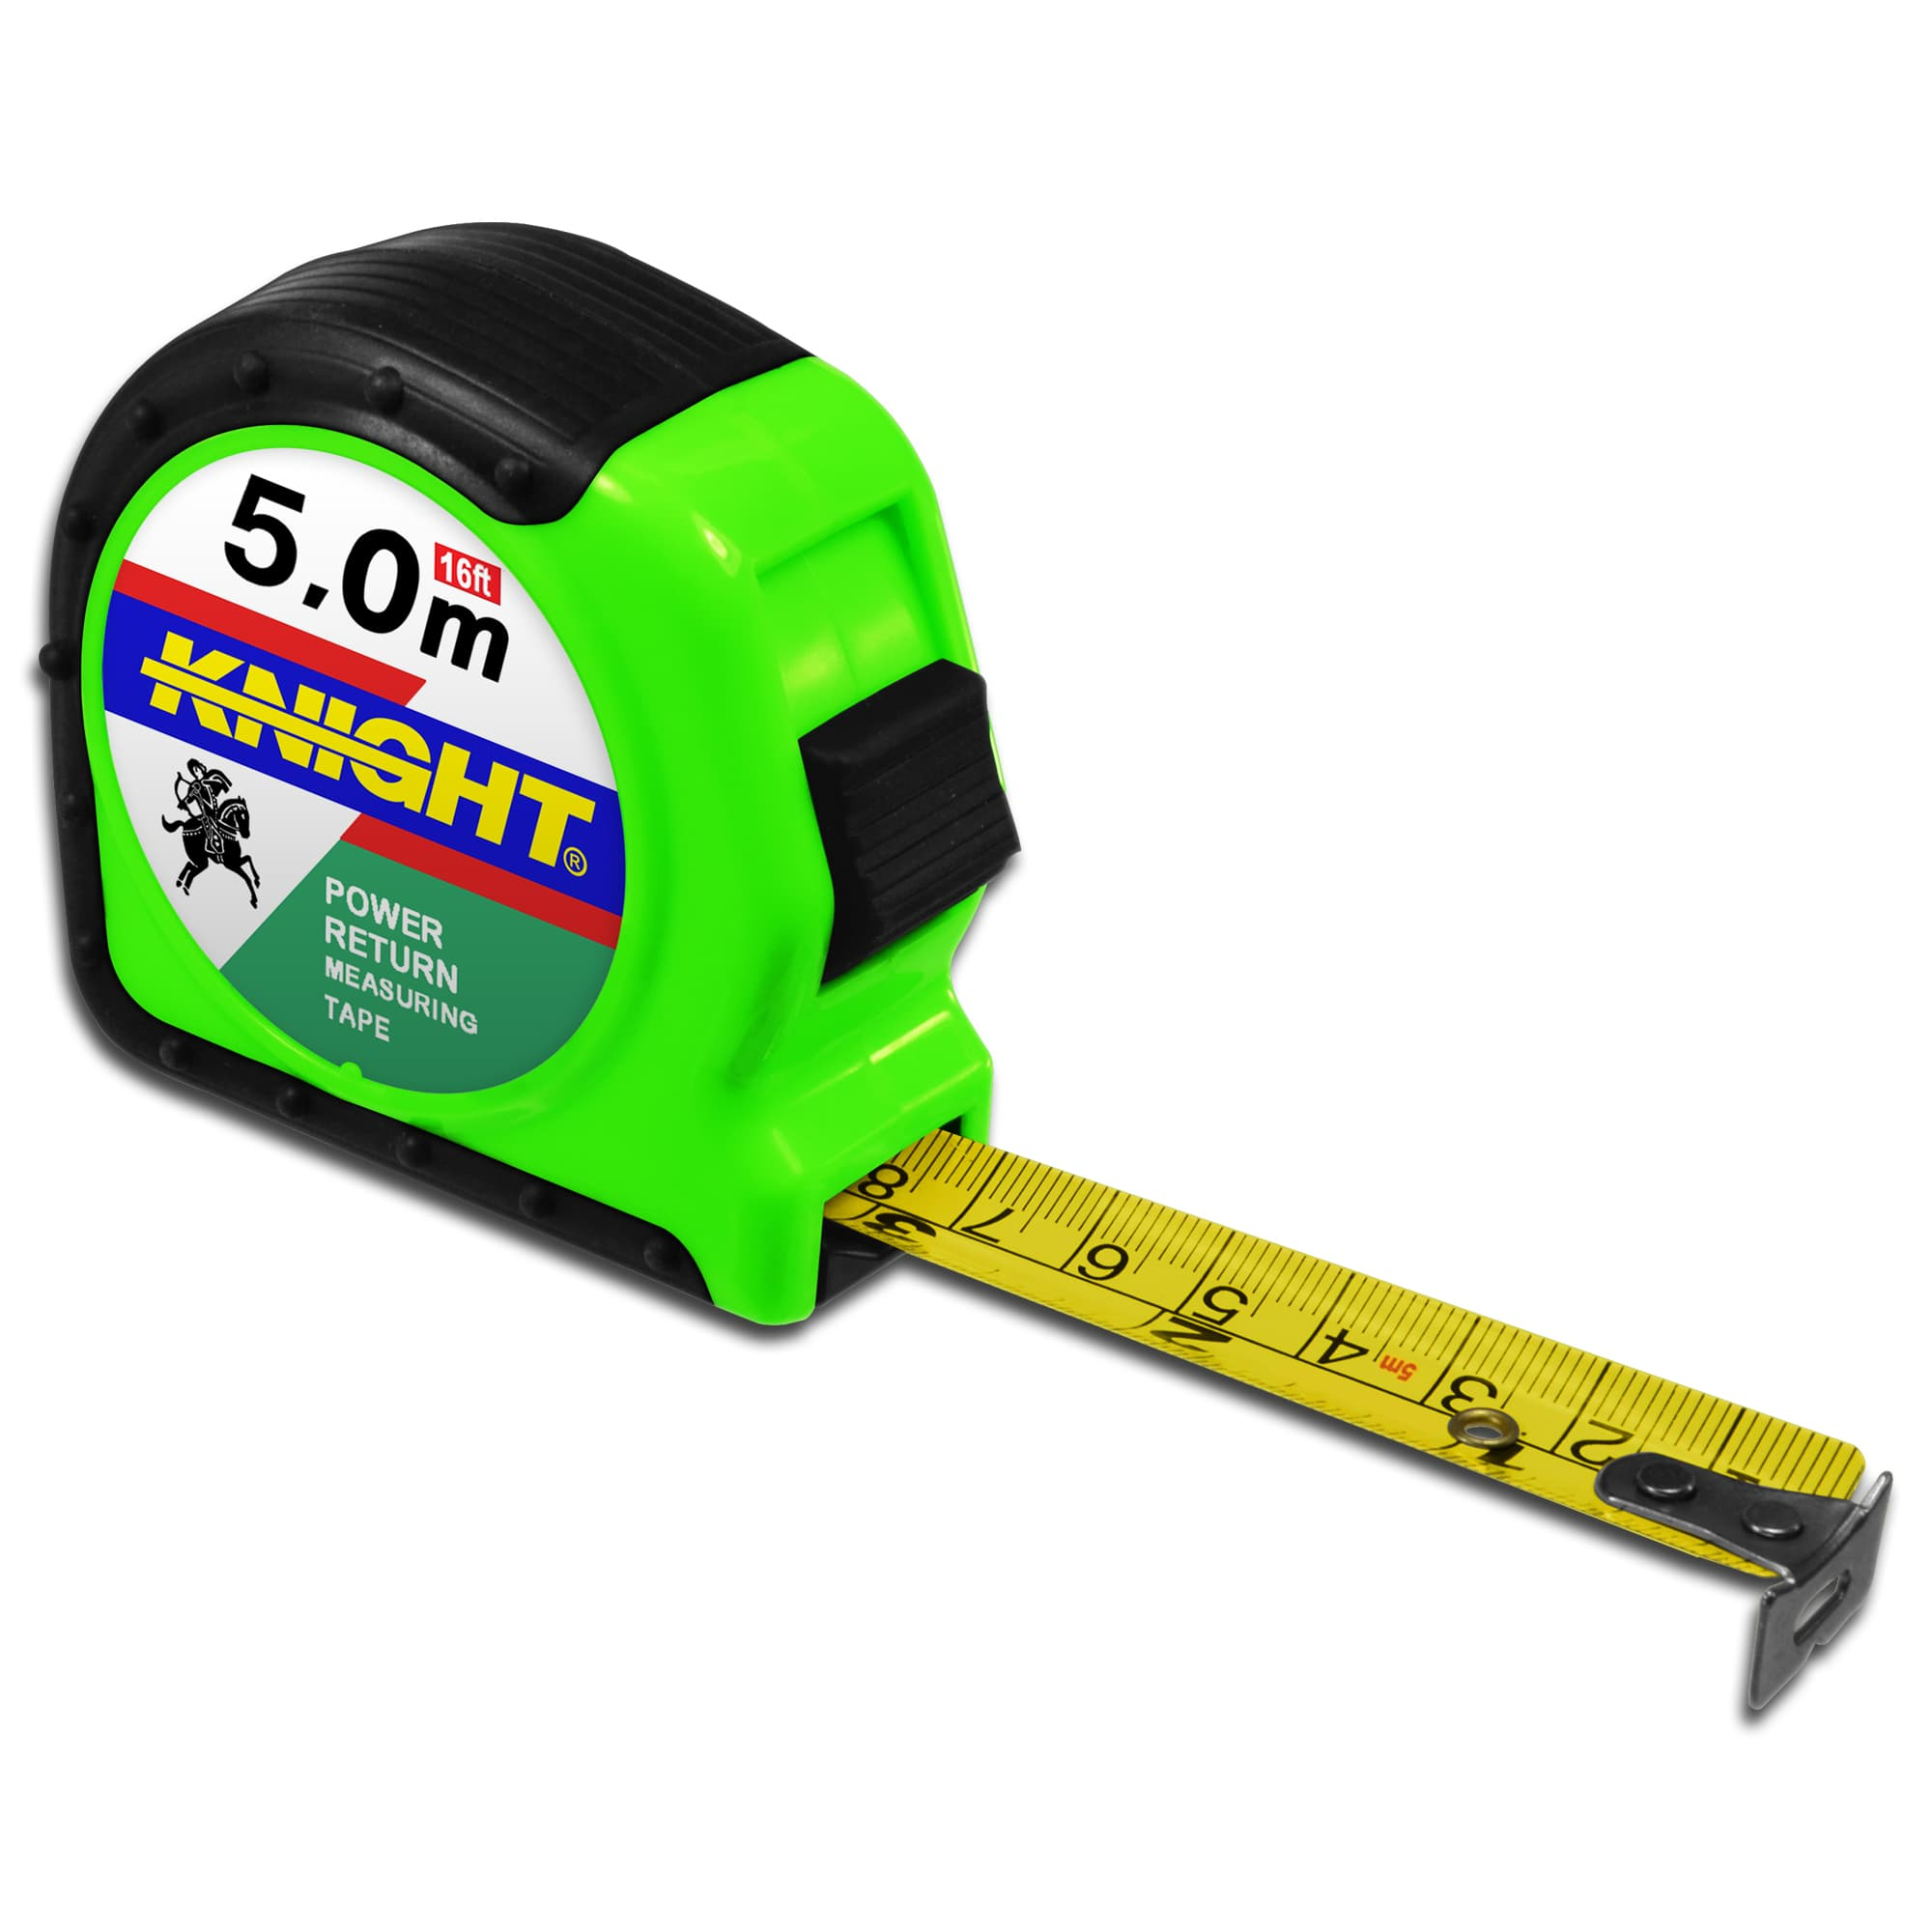 Rubber Case Printable Ruler Measuring Tape